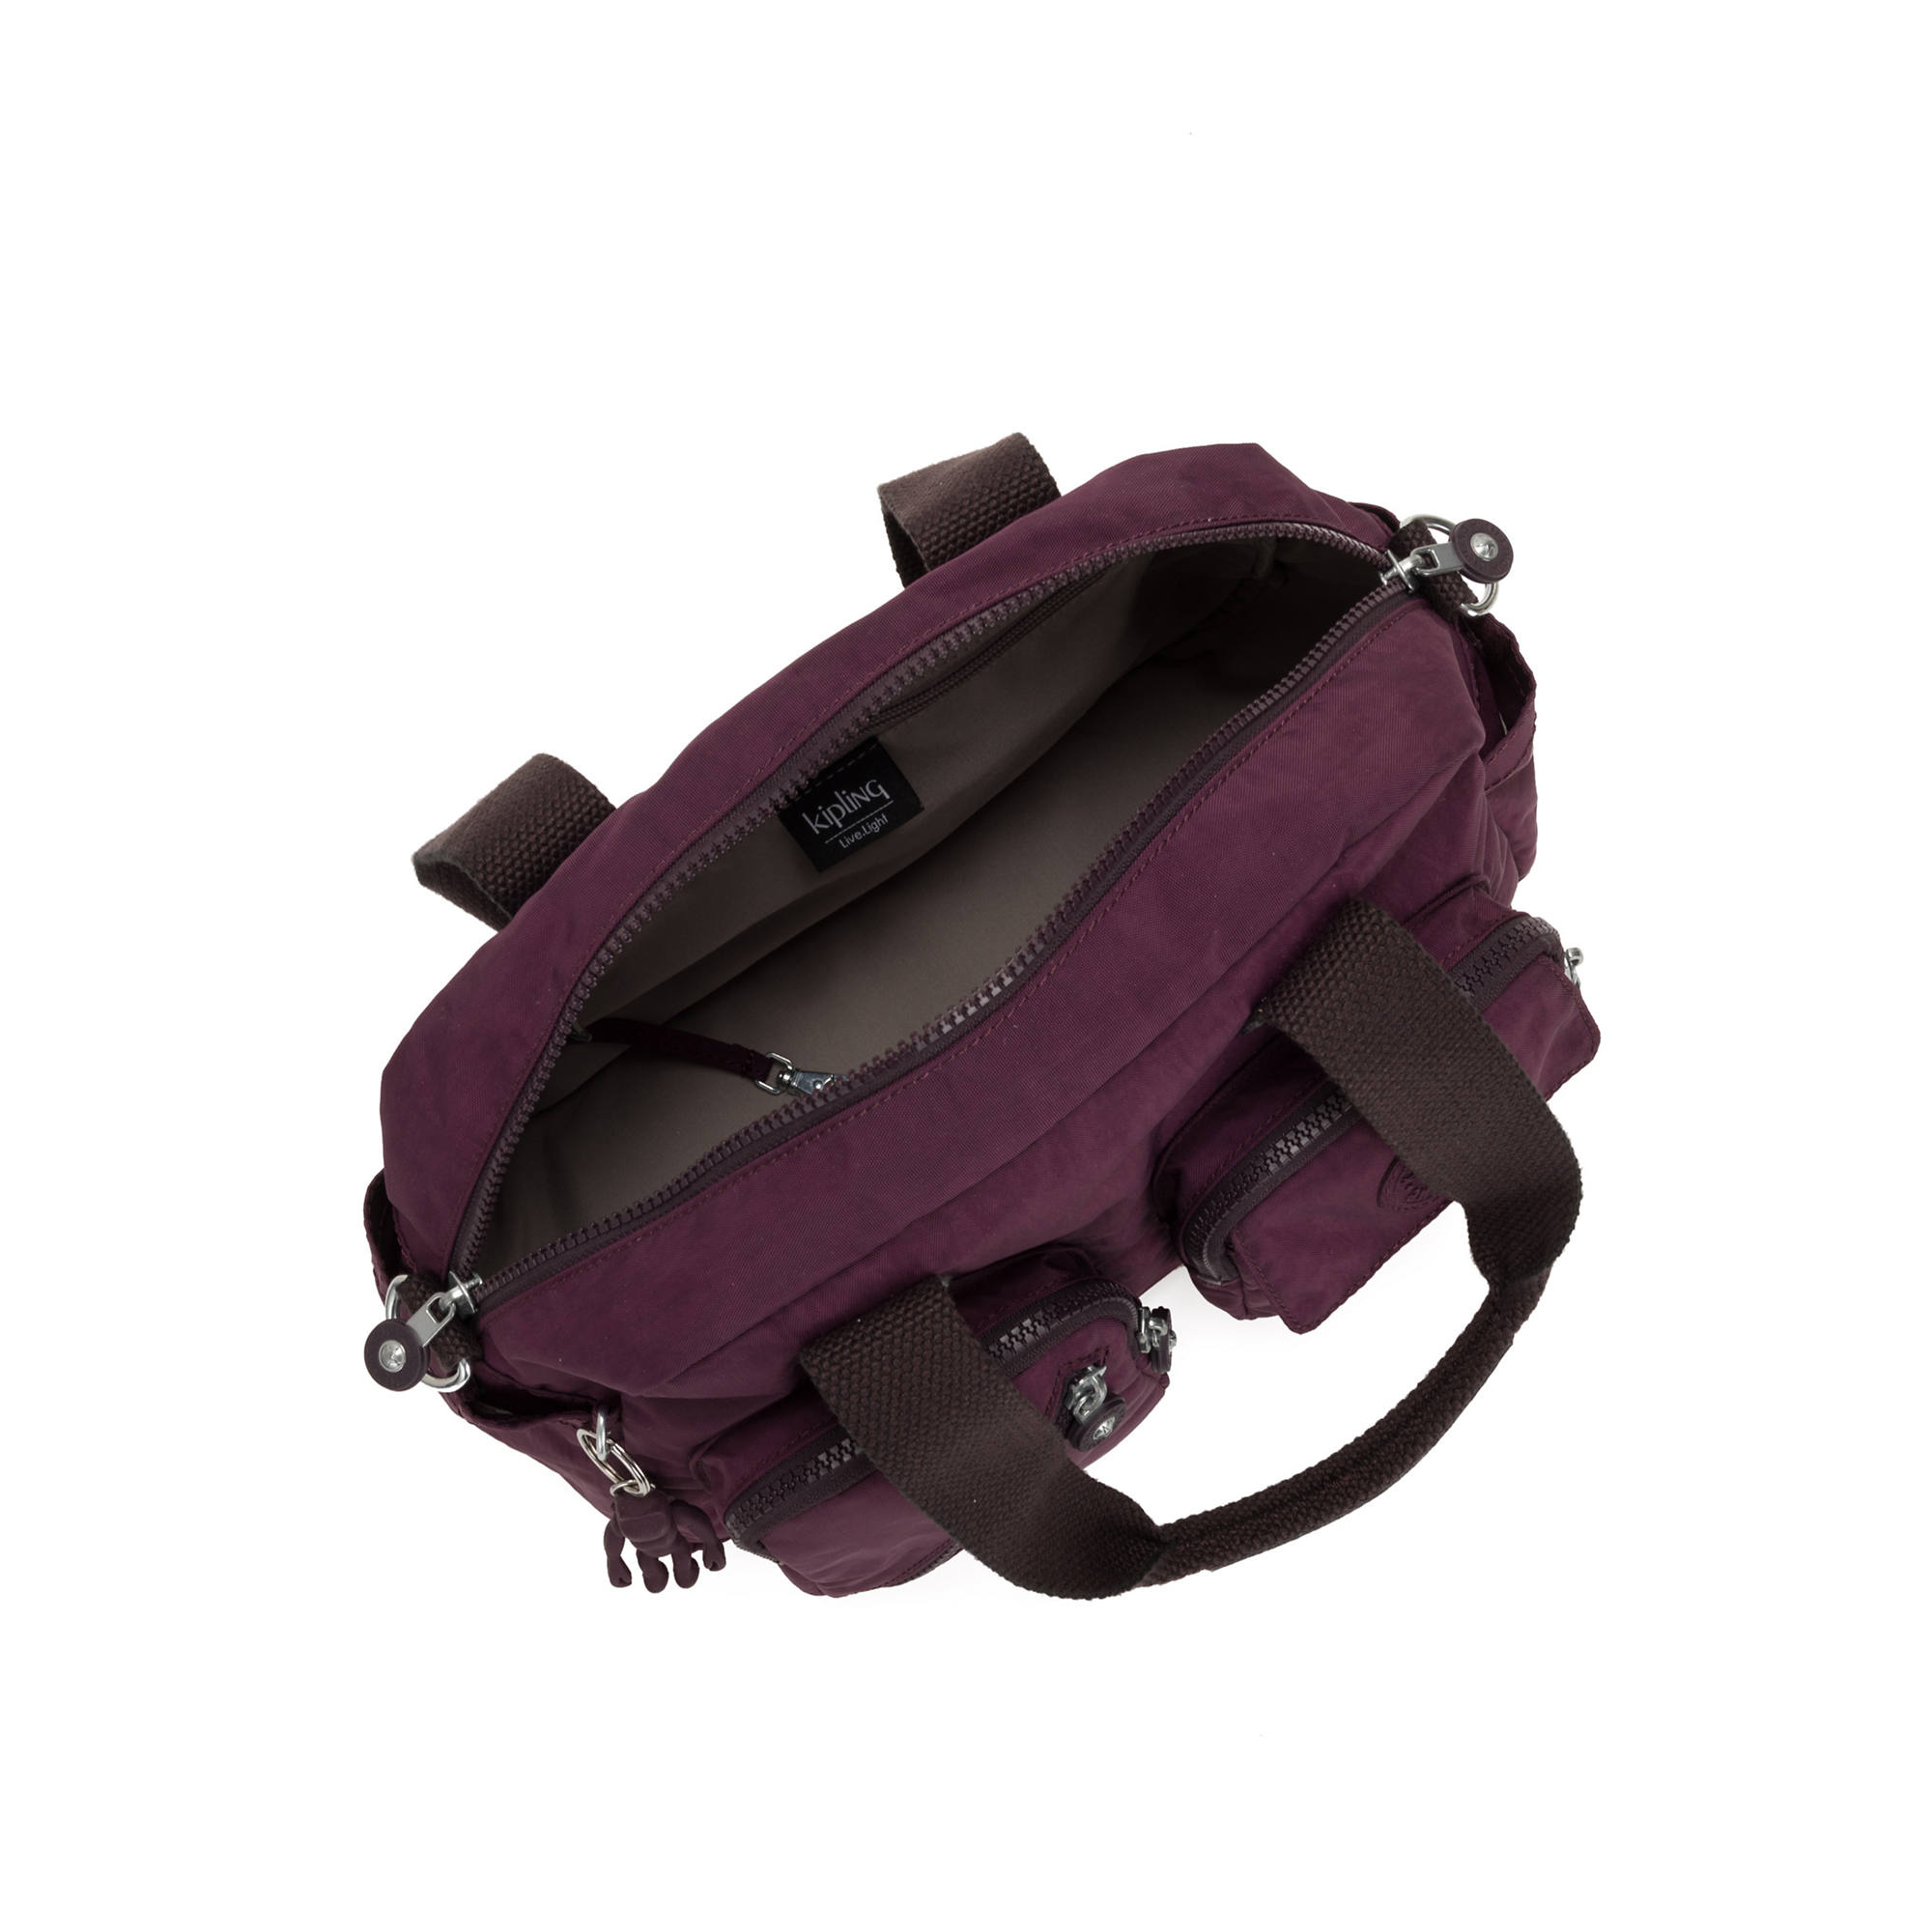 Kipling-Defea-Handbag miniatura 5